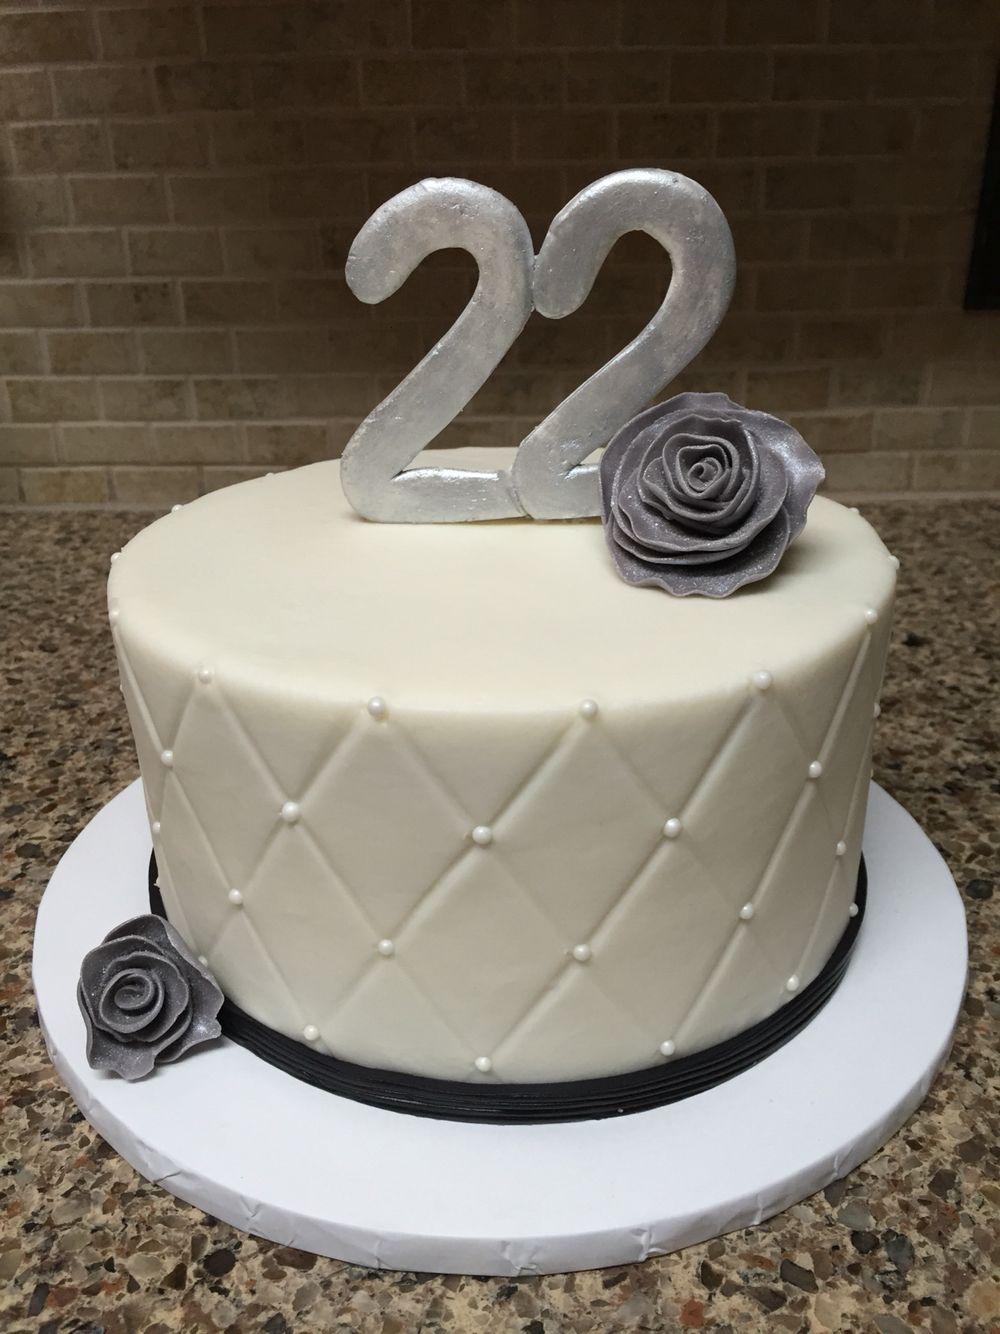 22 Birthday Cake : birthday, Black, White, Birthday, 7-inch, Chocolate, Fudge, Covered, Quilted, Vanilla, Butterc…, Cakes,, Cakes